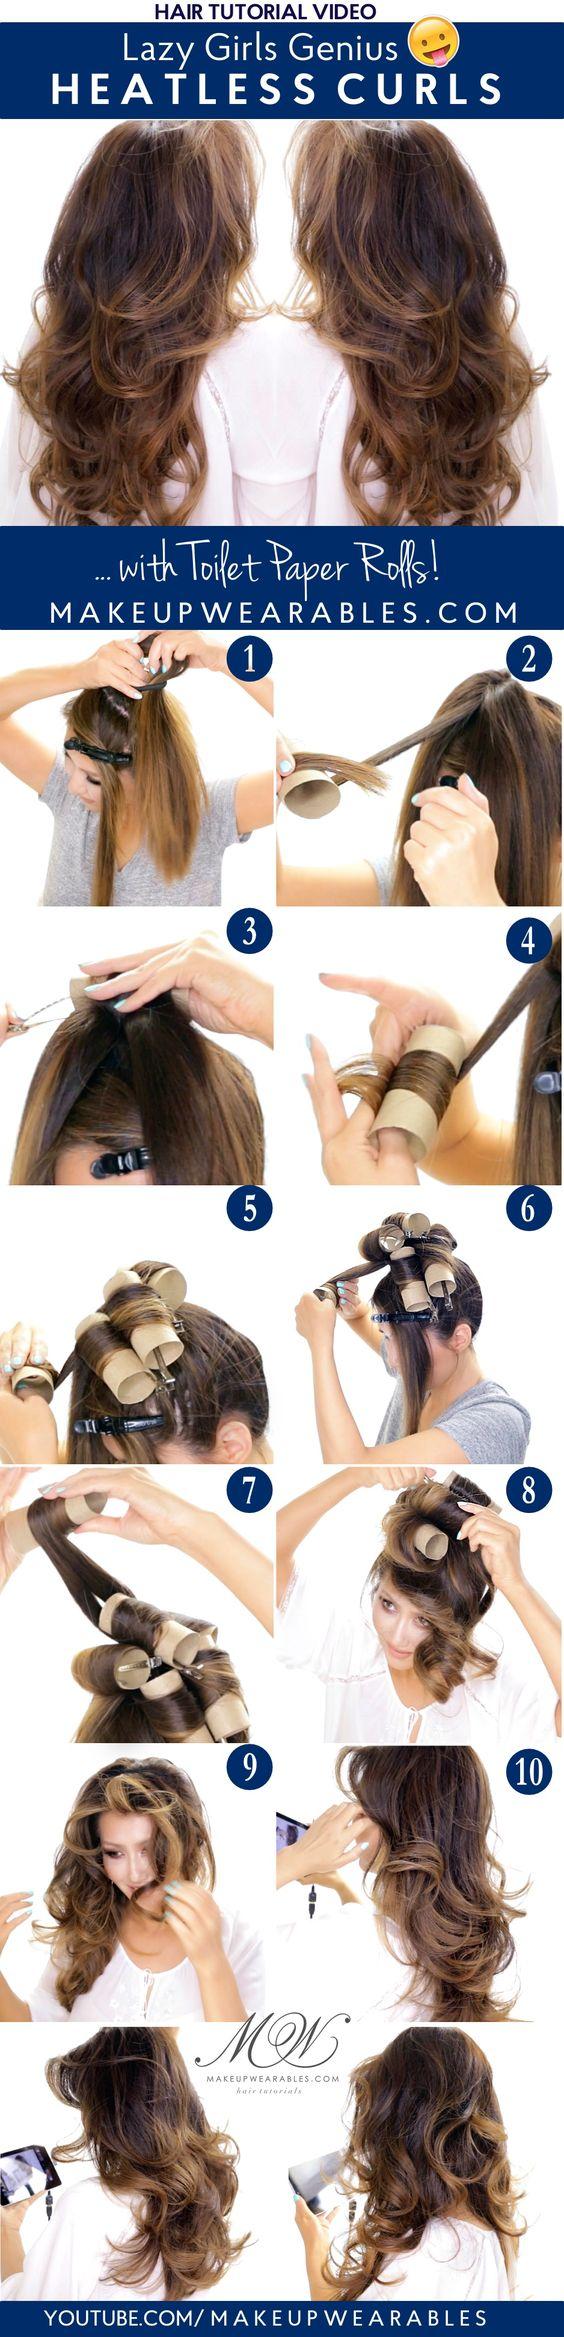 Lazy Girls Genius Heatless Curls Overnight Tutorial | #hairstyles